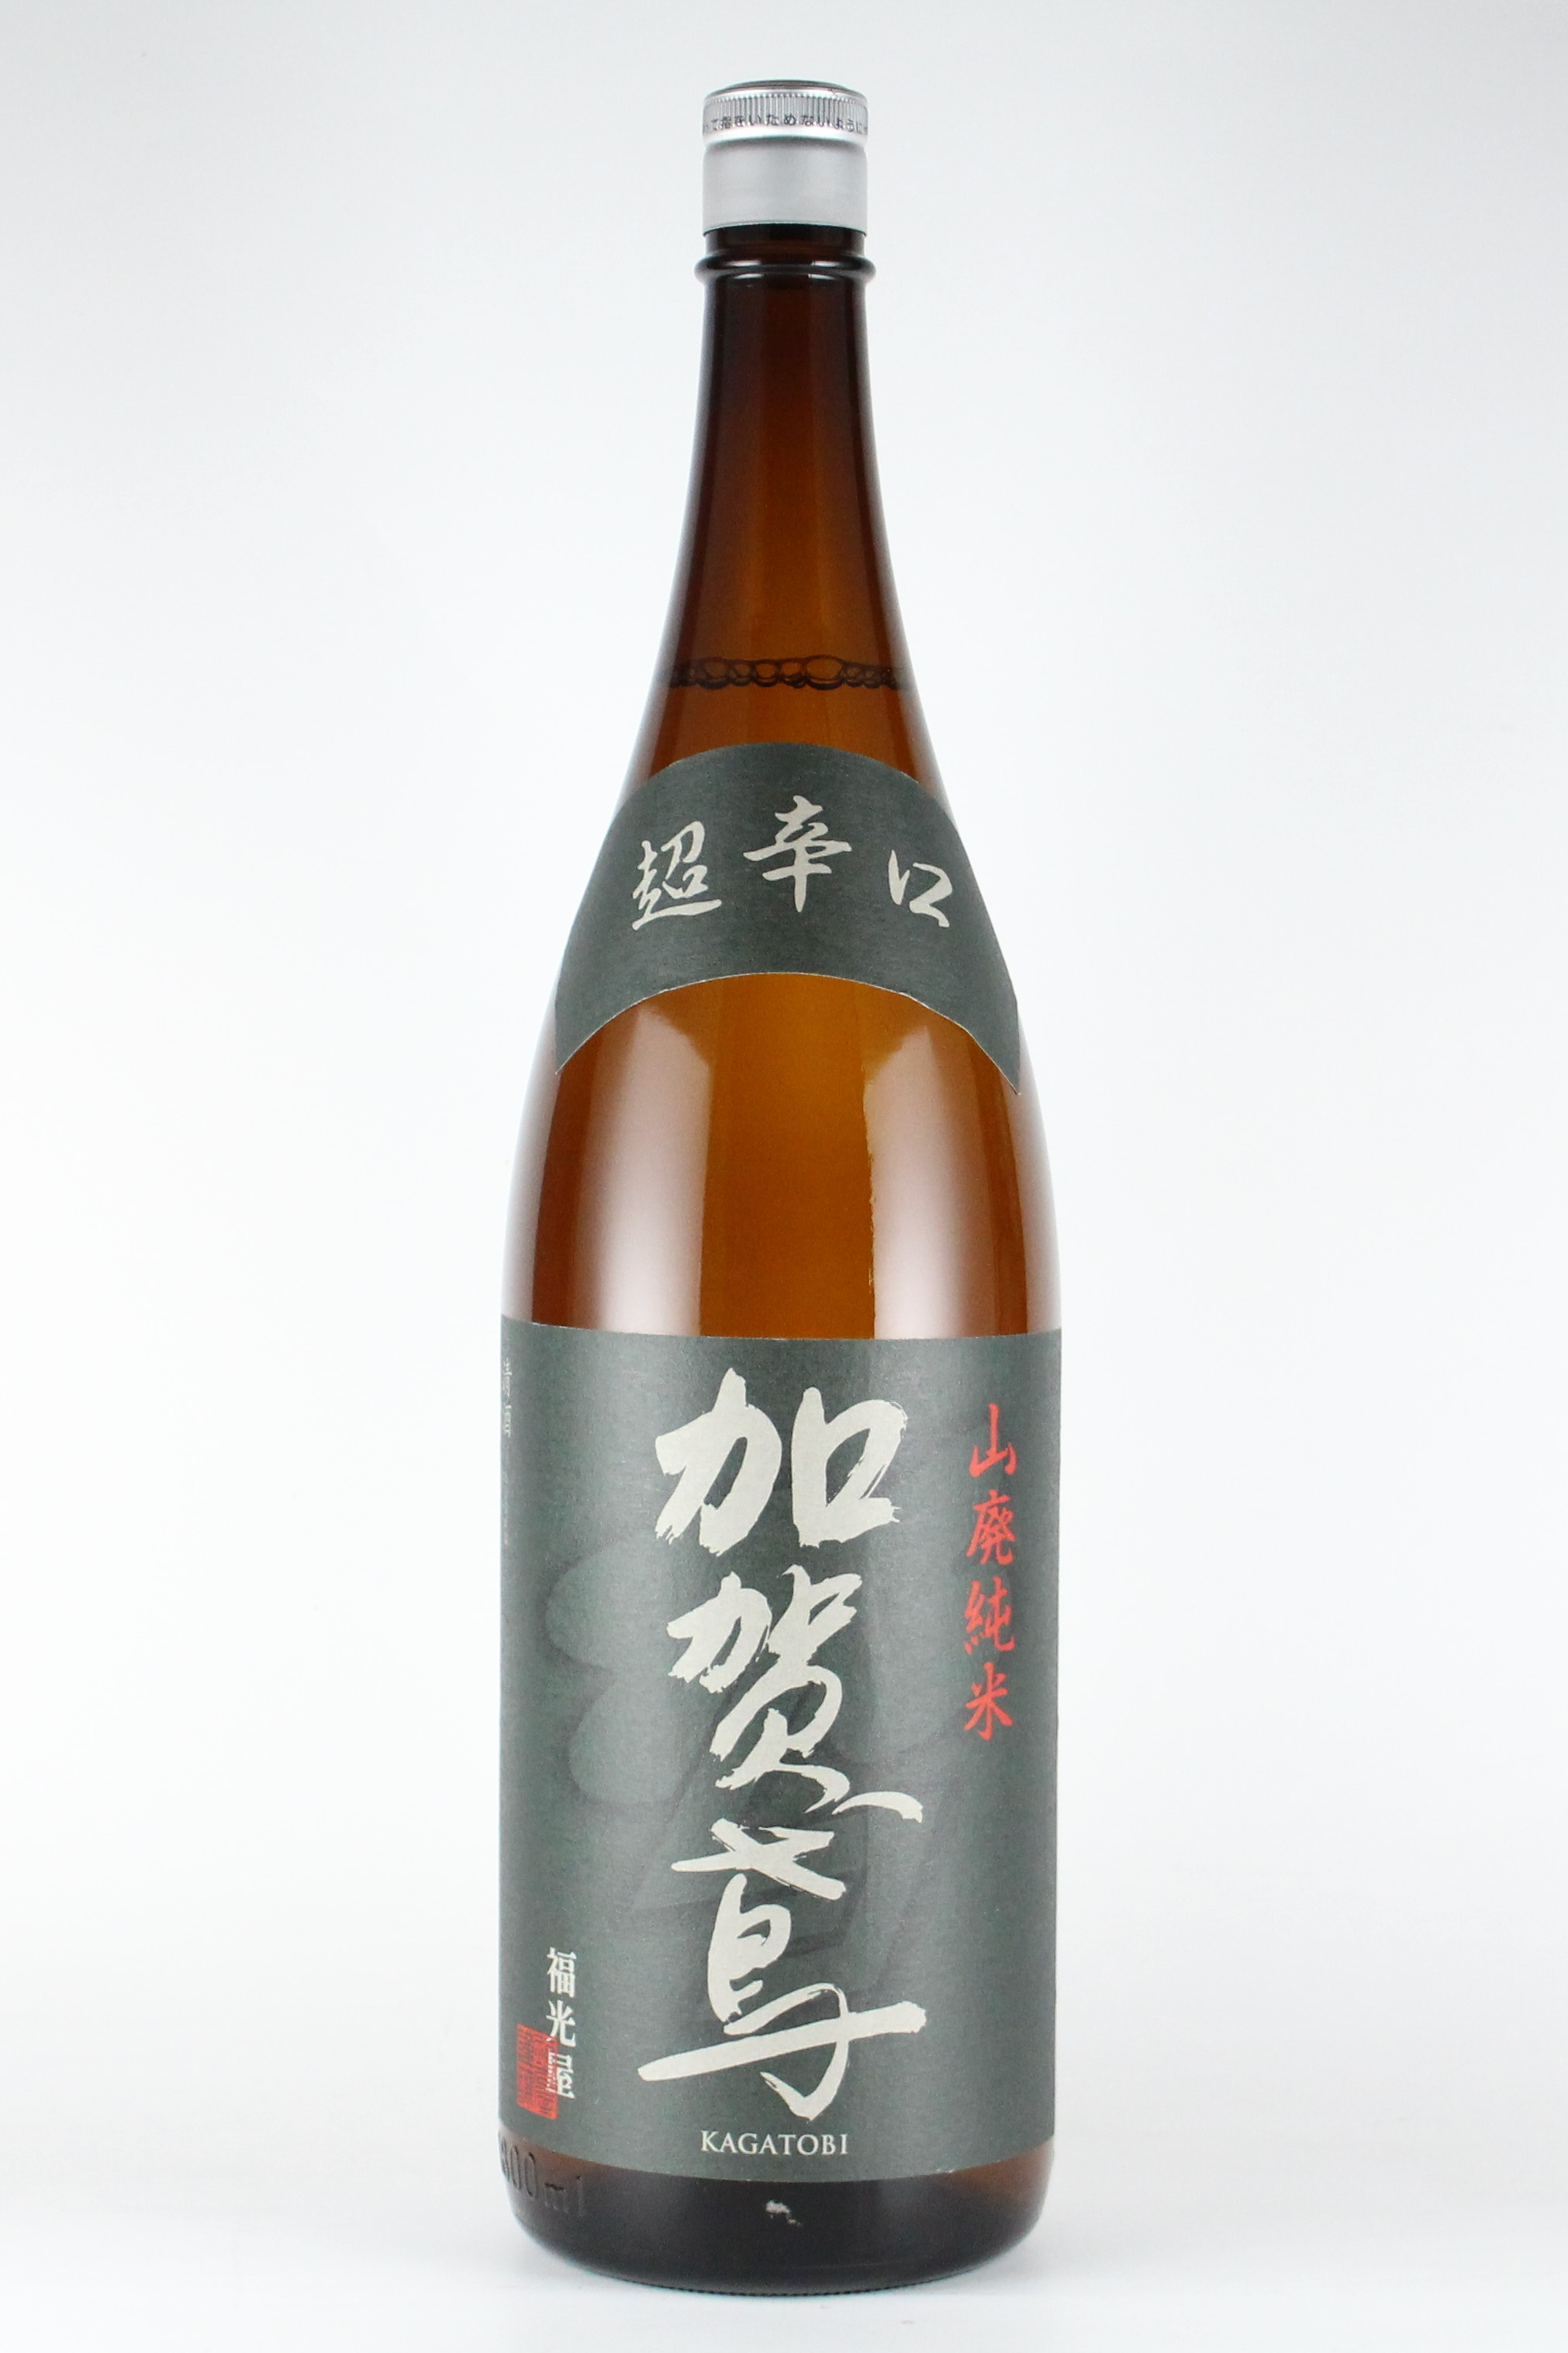 Takachiyo59 CHAPTER SIX 純米吟醸無調整生原酒 美山錦 500ml 【新潟/高千代酒造】